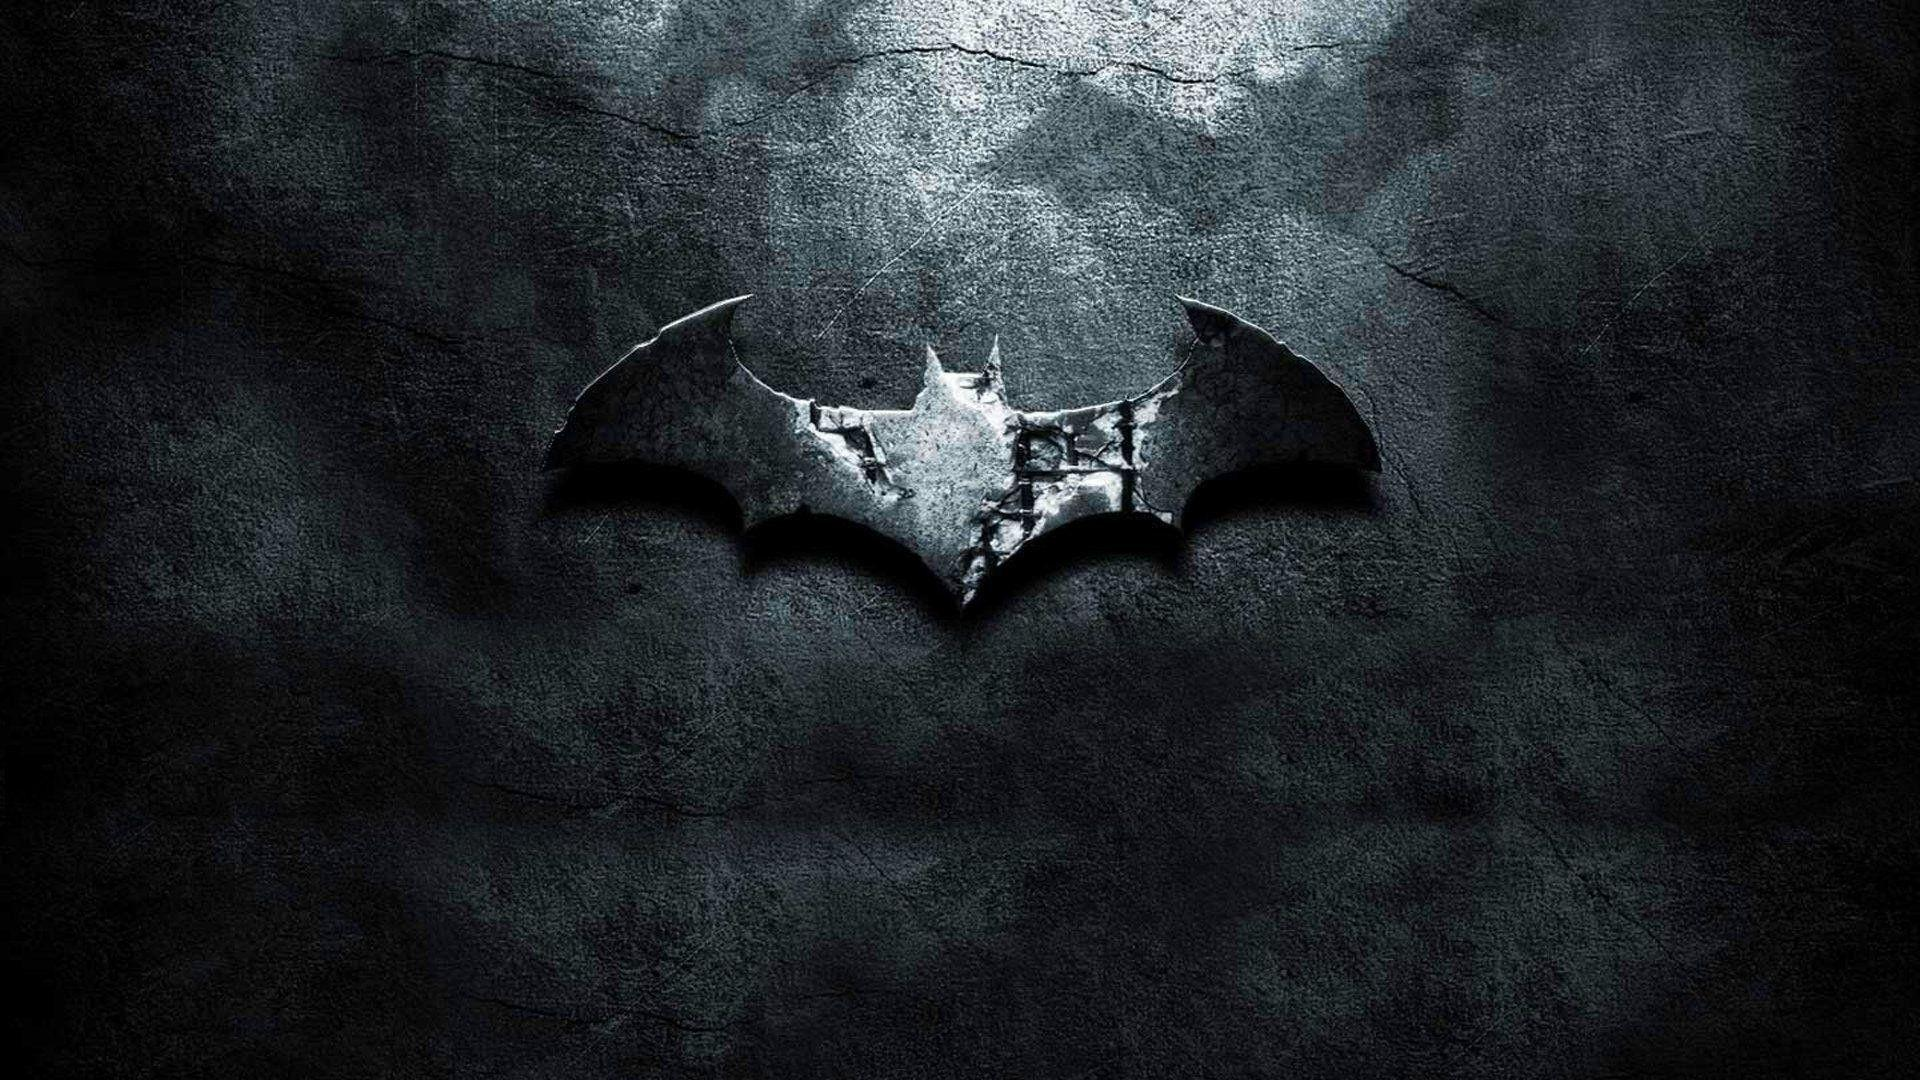 4k Batman Desktop Wallpapers Wallpaper Cave